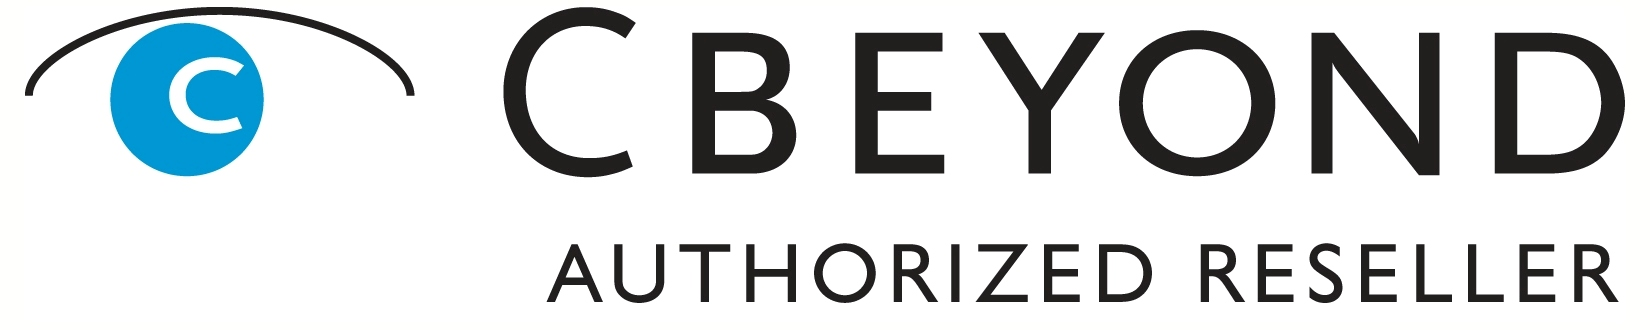 Cbeyond logo